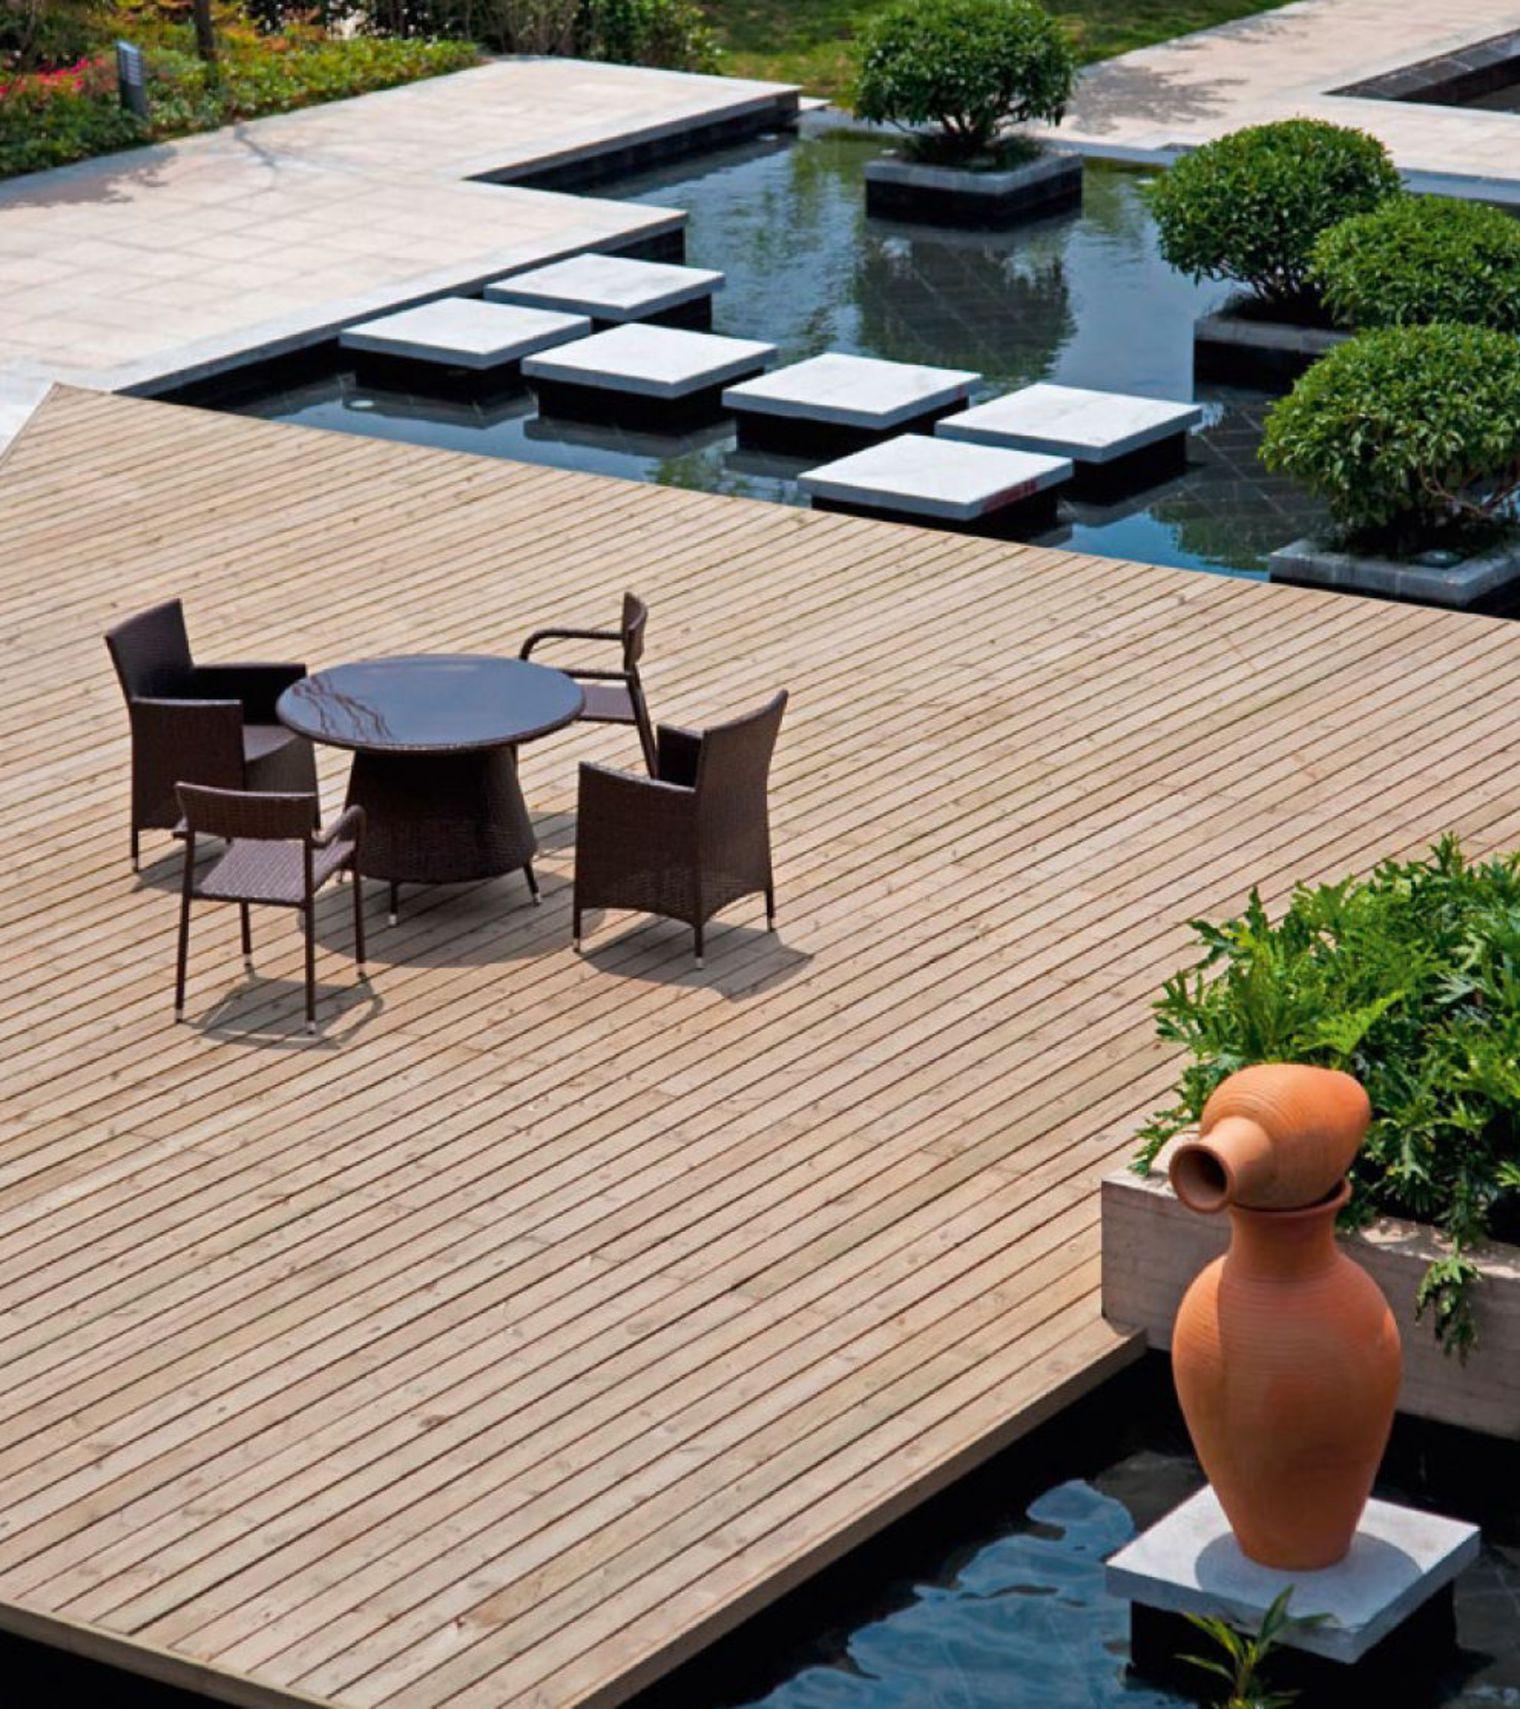 Terrasse bois pour piscine hors sol piscines hors sol for Bois composite pour terrasse piscine